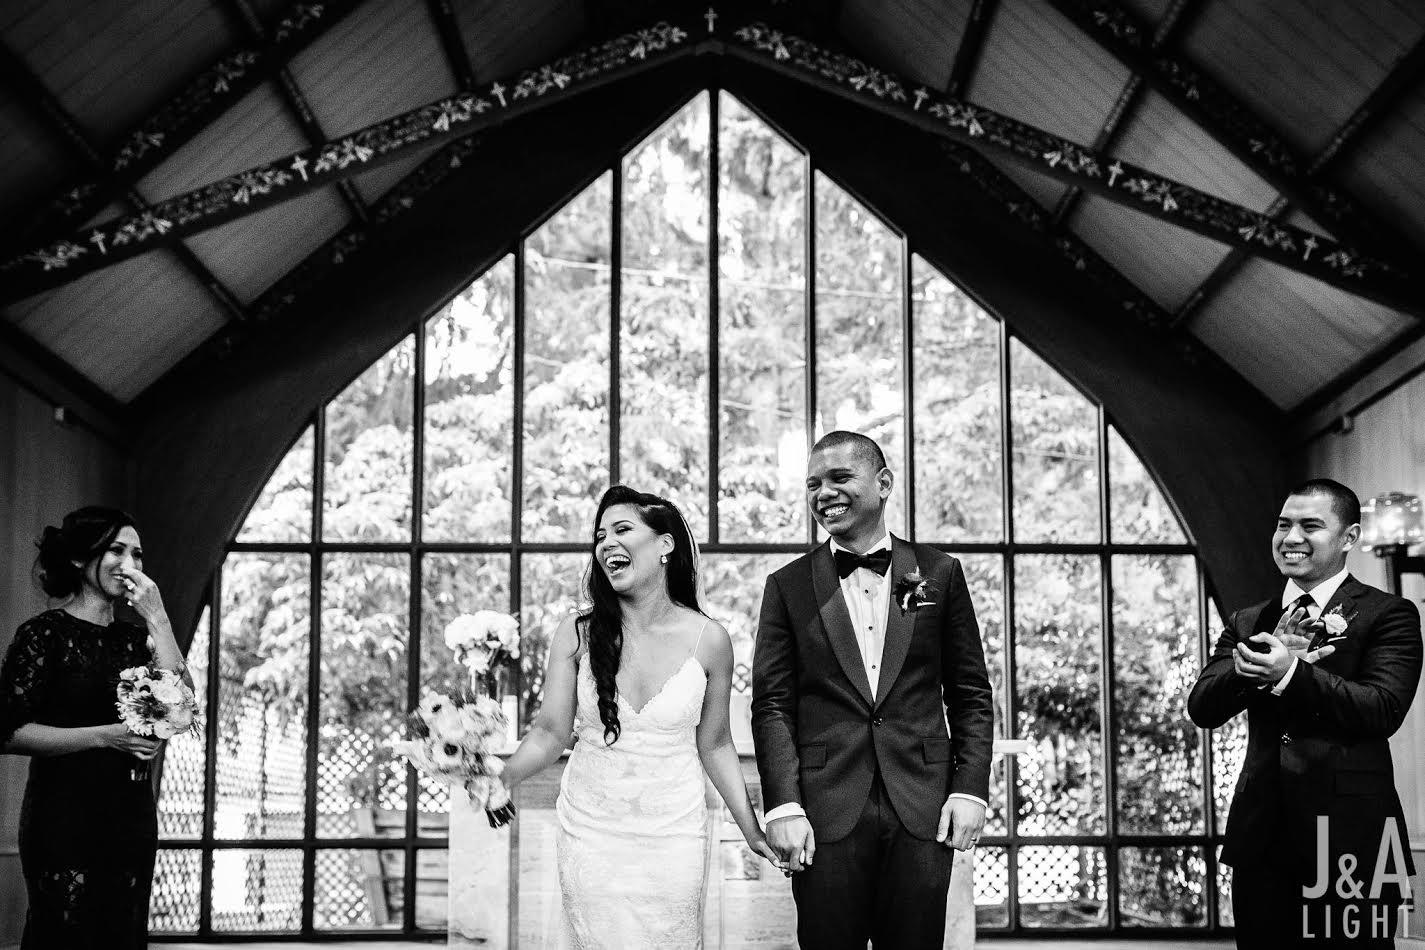 Cat & Jeyel Wedding Review